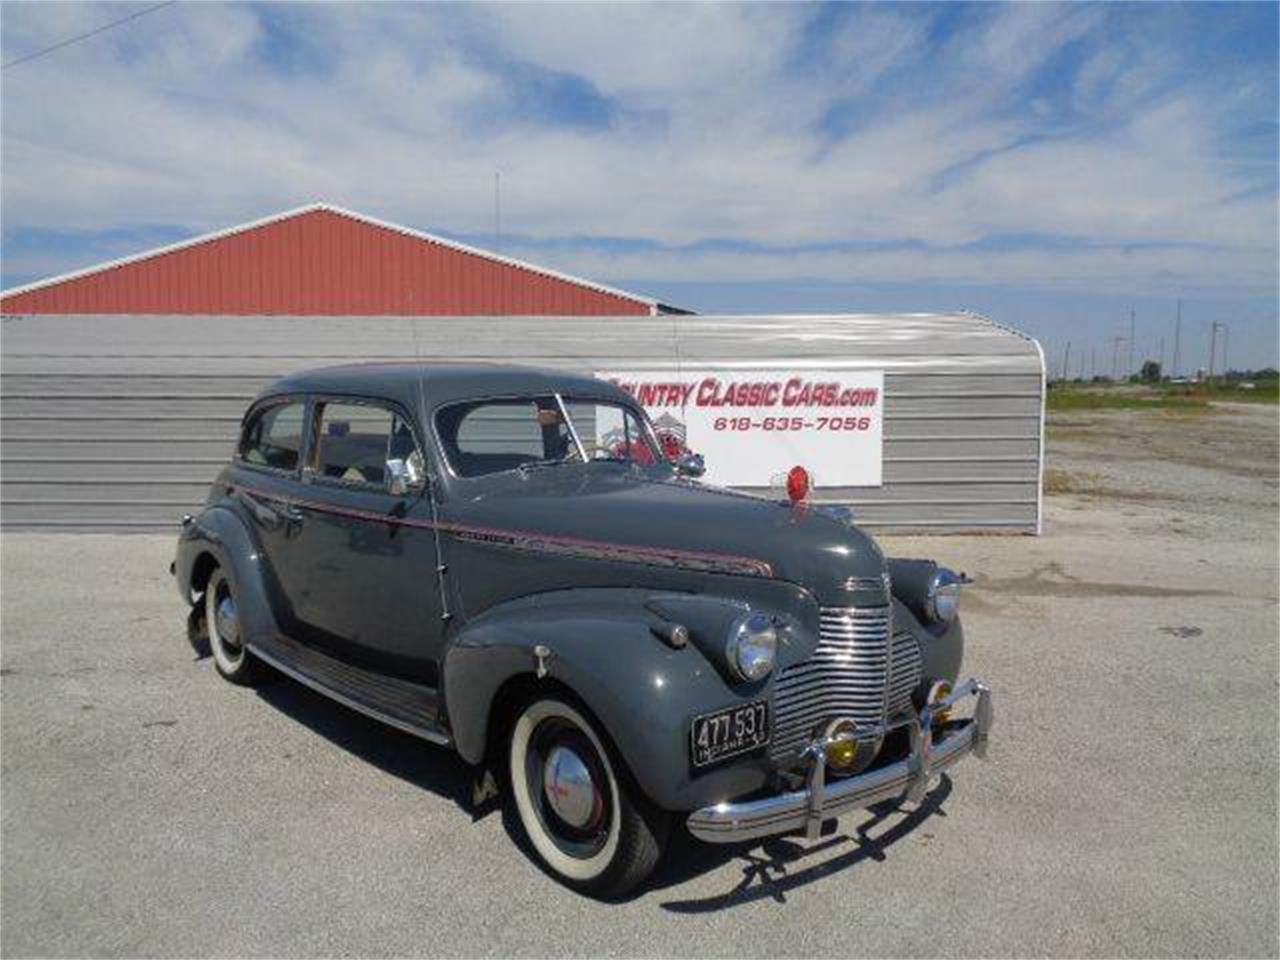 For Sale: 1940 Chevrolet Special Deluxe in Staunton, Illinois